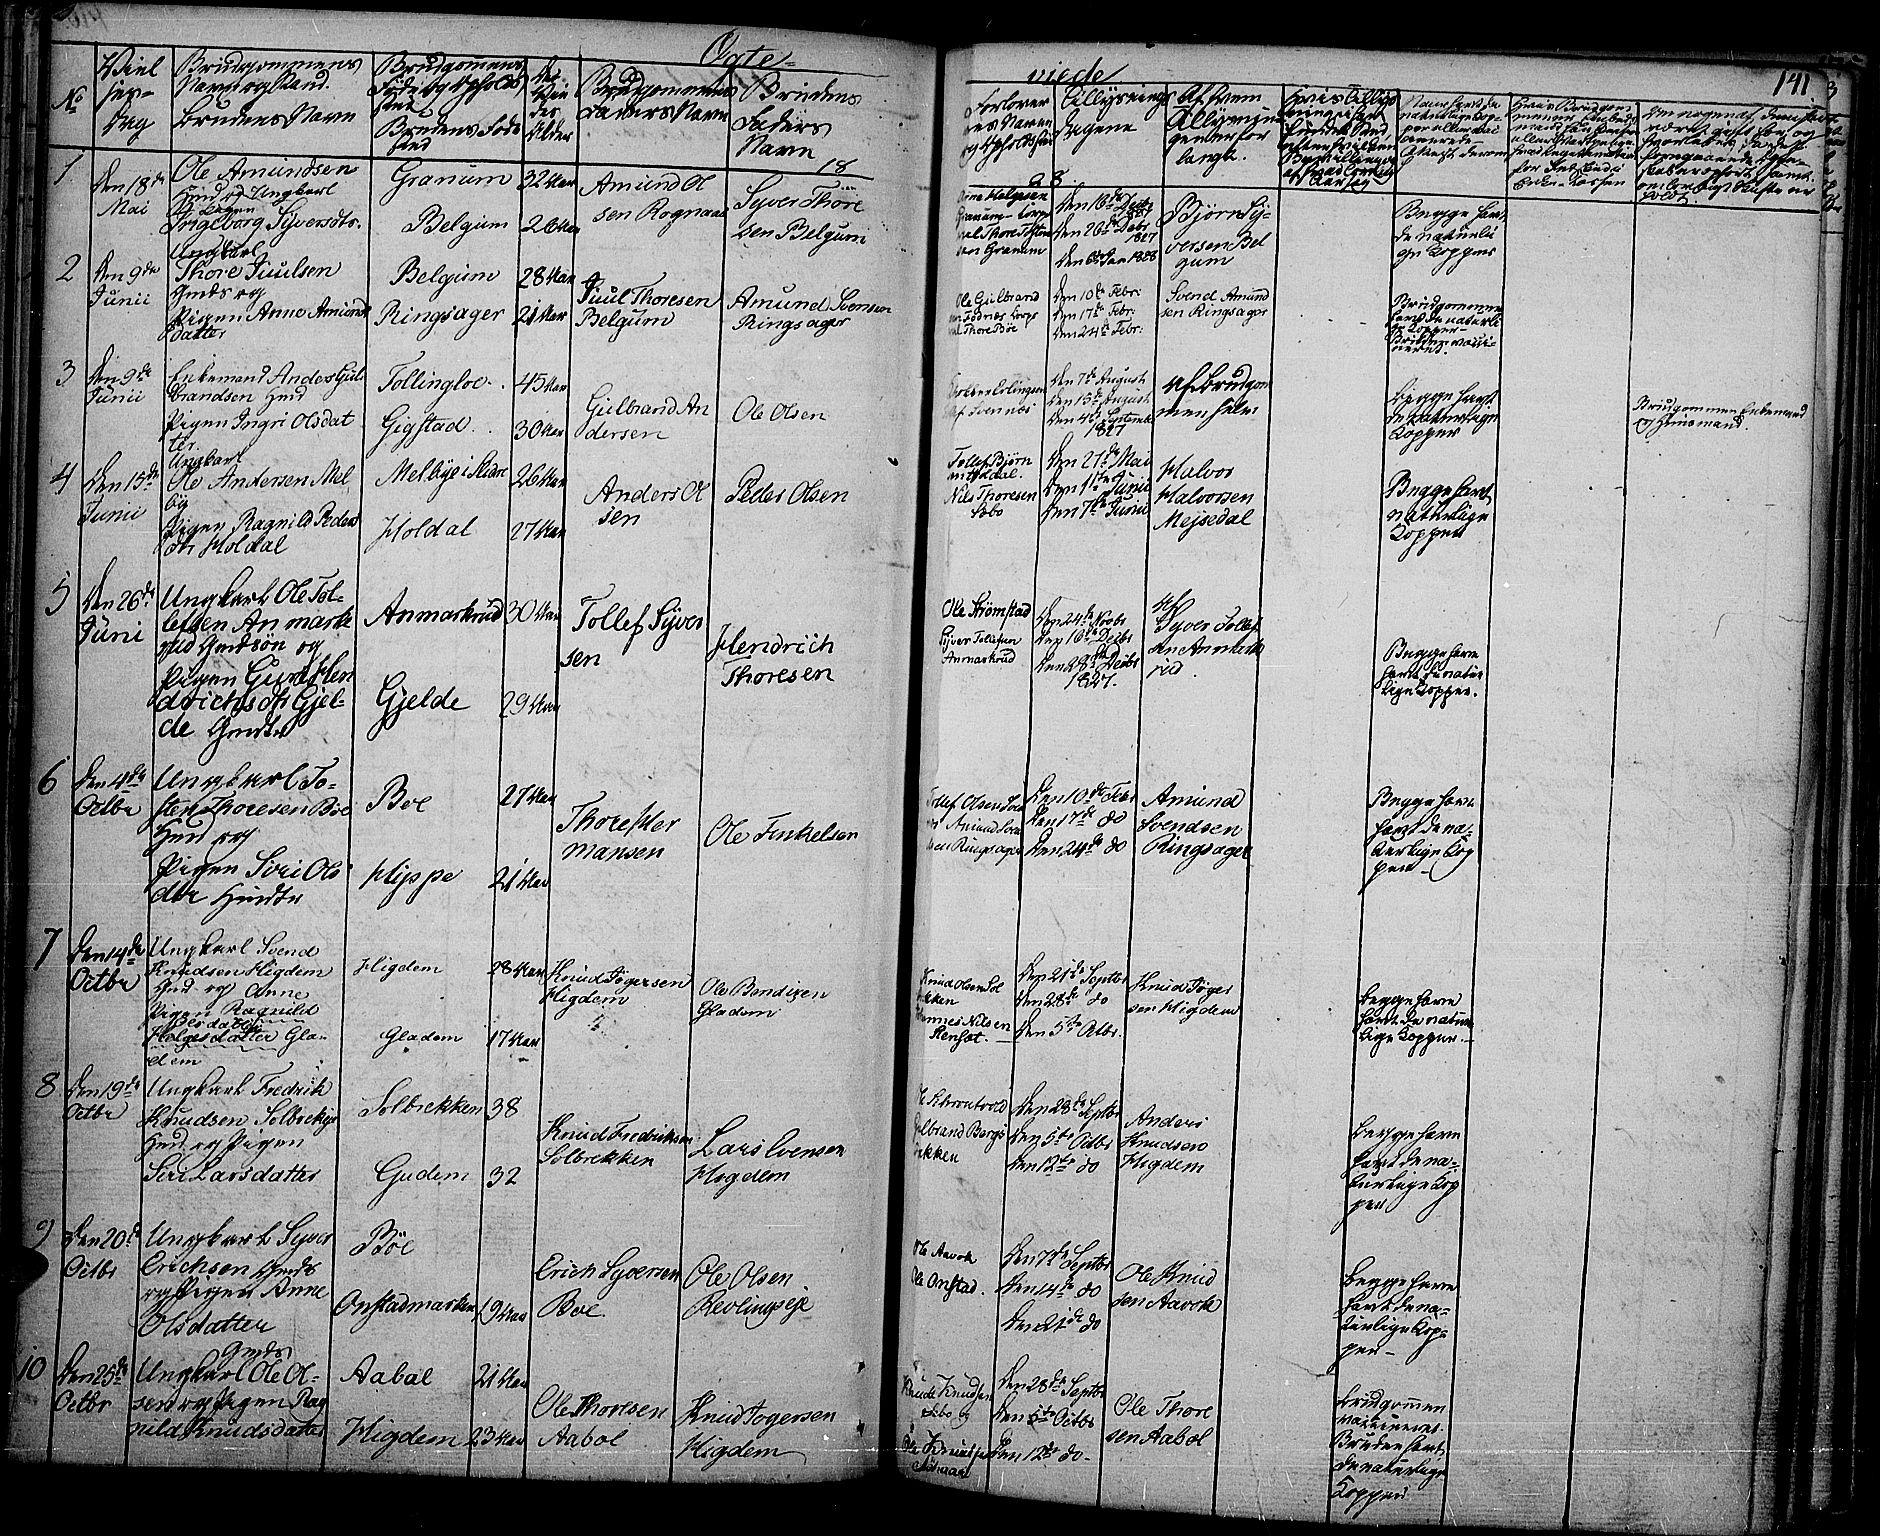 SAH, Nord-Aurdal prestekontor, Ministerialbok nr. 3, 1828-1841, s. 141